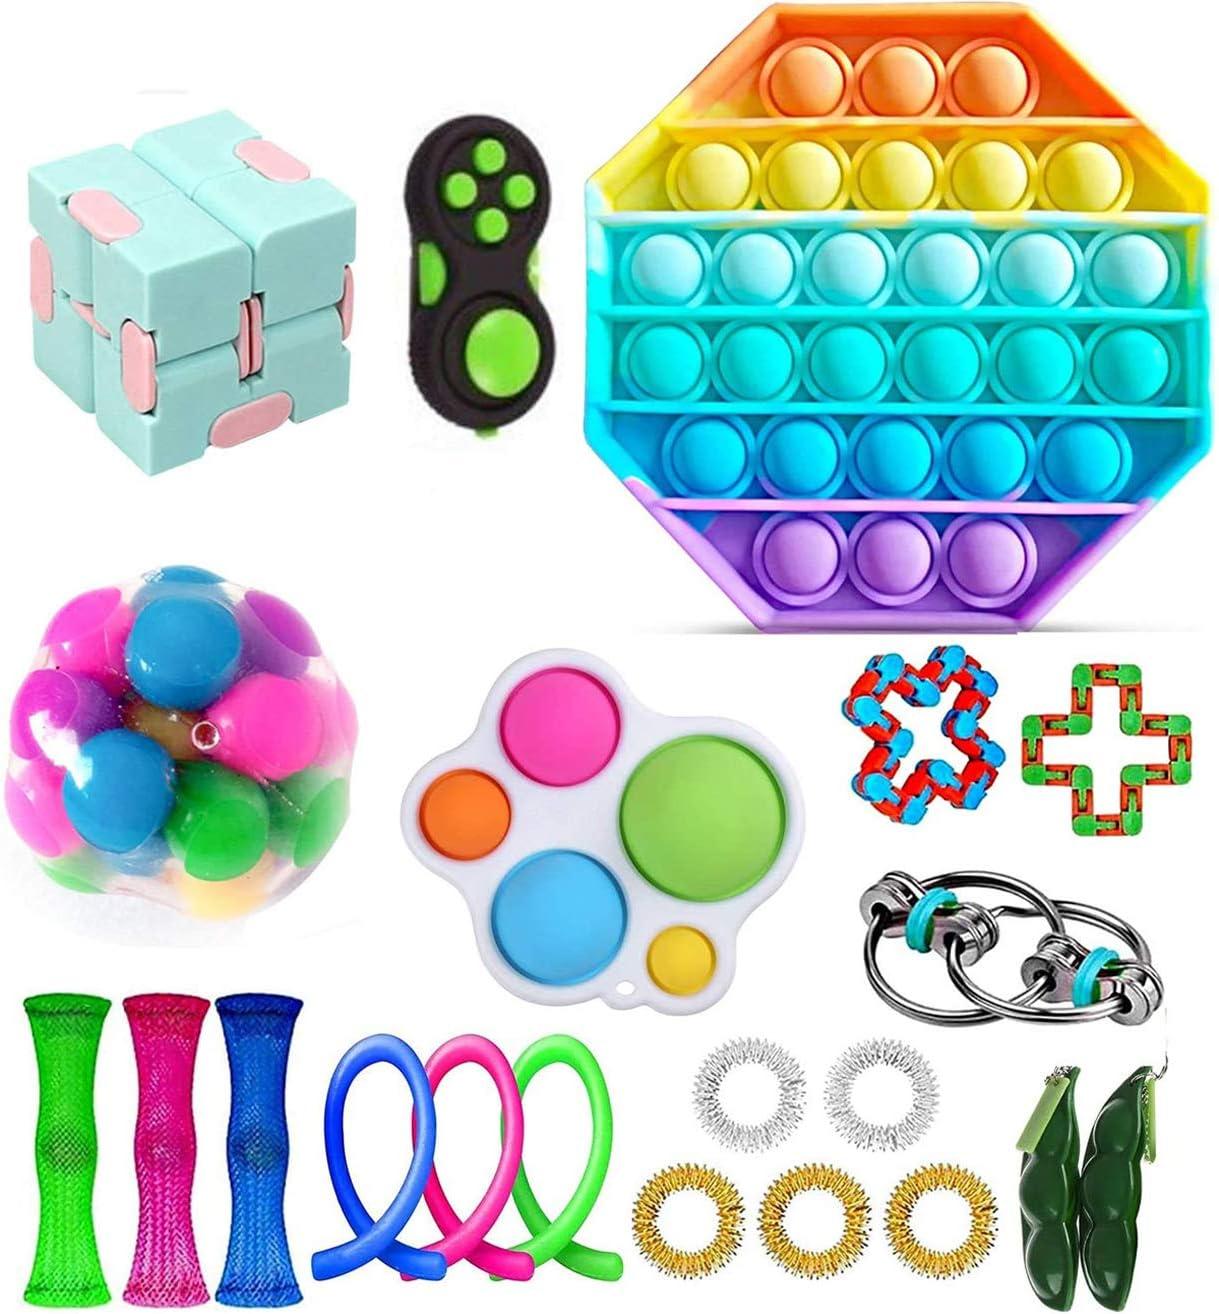 Fidget Toy Packs, Set De Juguetes Sensoriales Fidget Baratos con Simple Dimple Pop Bubble Infinite Cube Stress Ball y Anti Stress Relief Toy Stress Ball